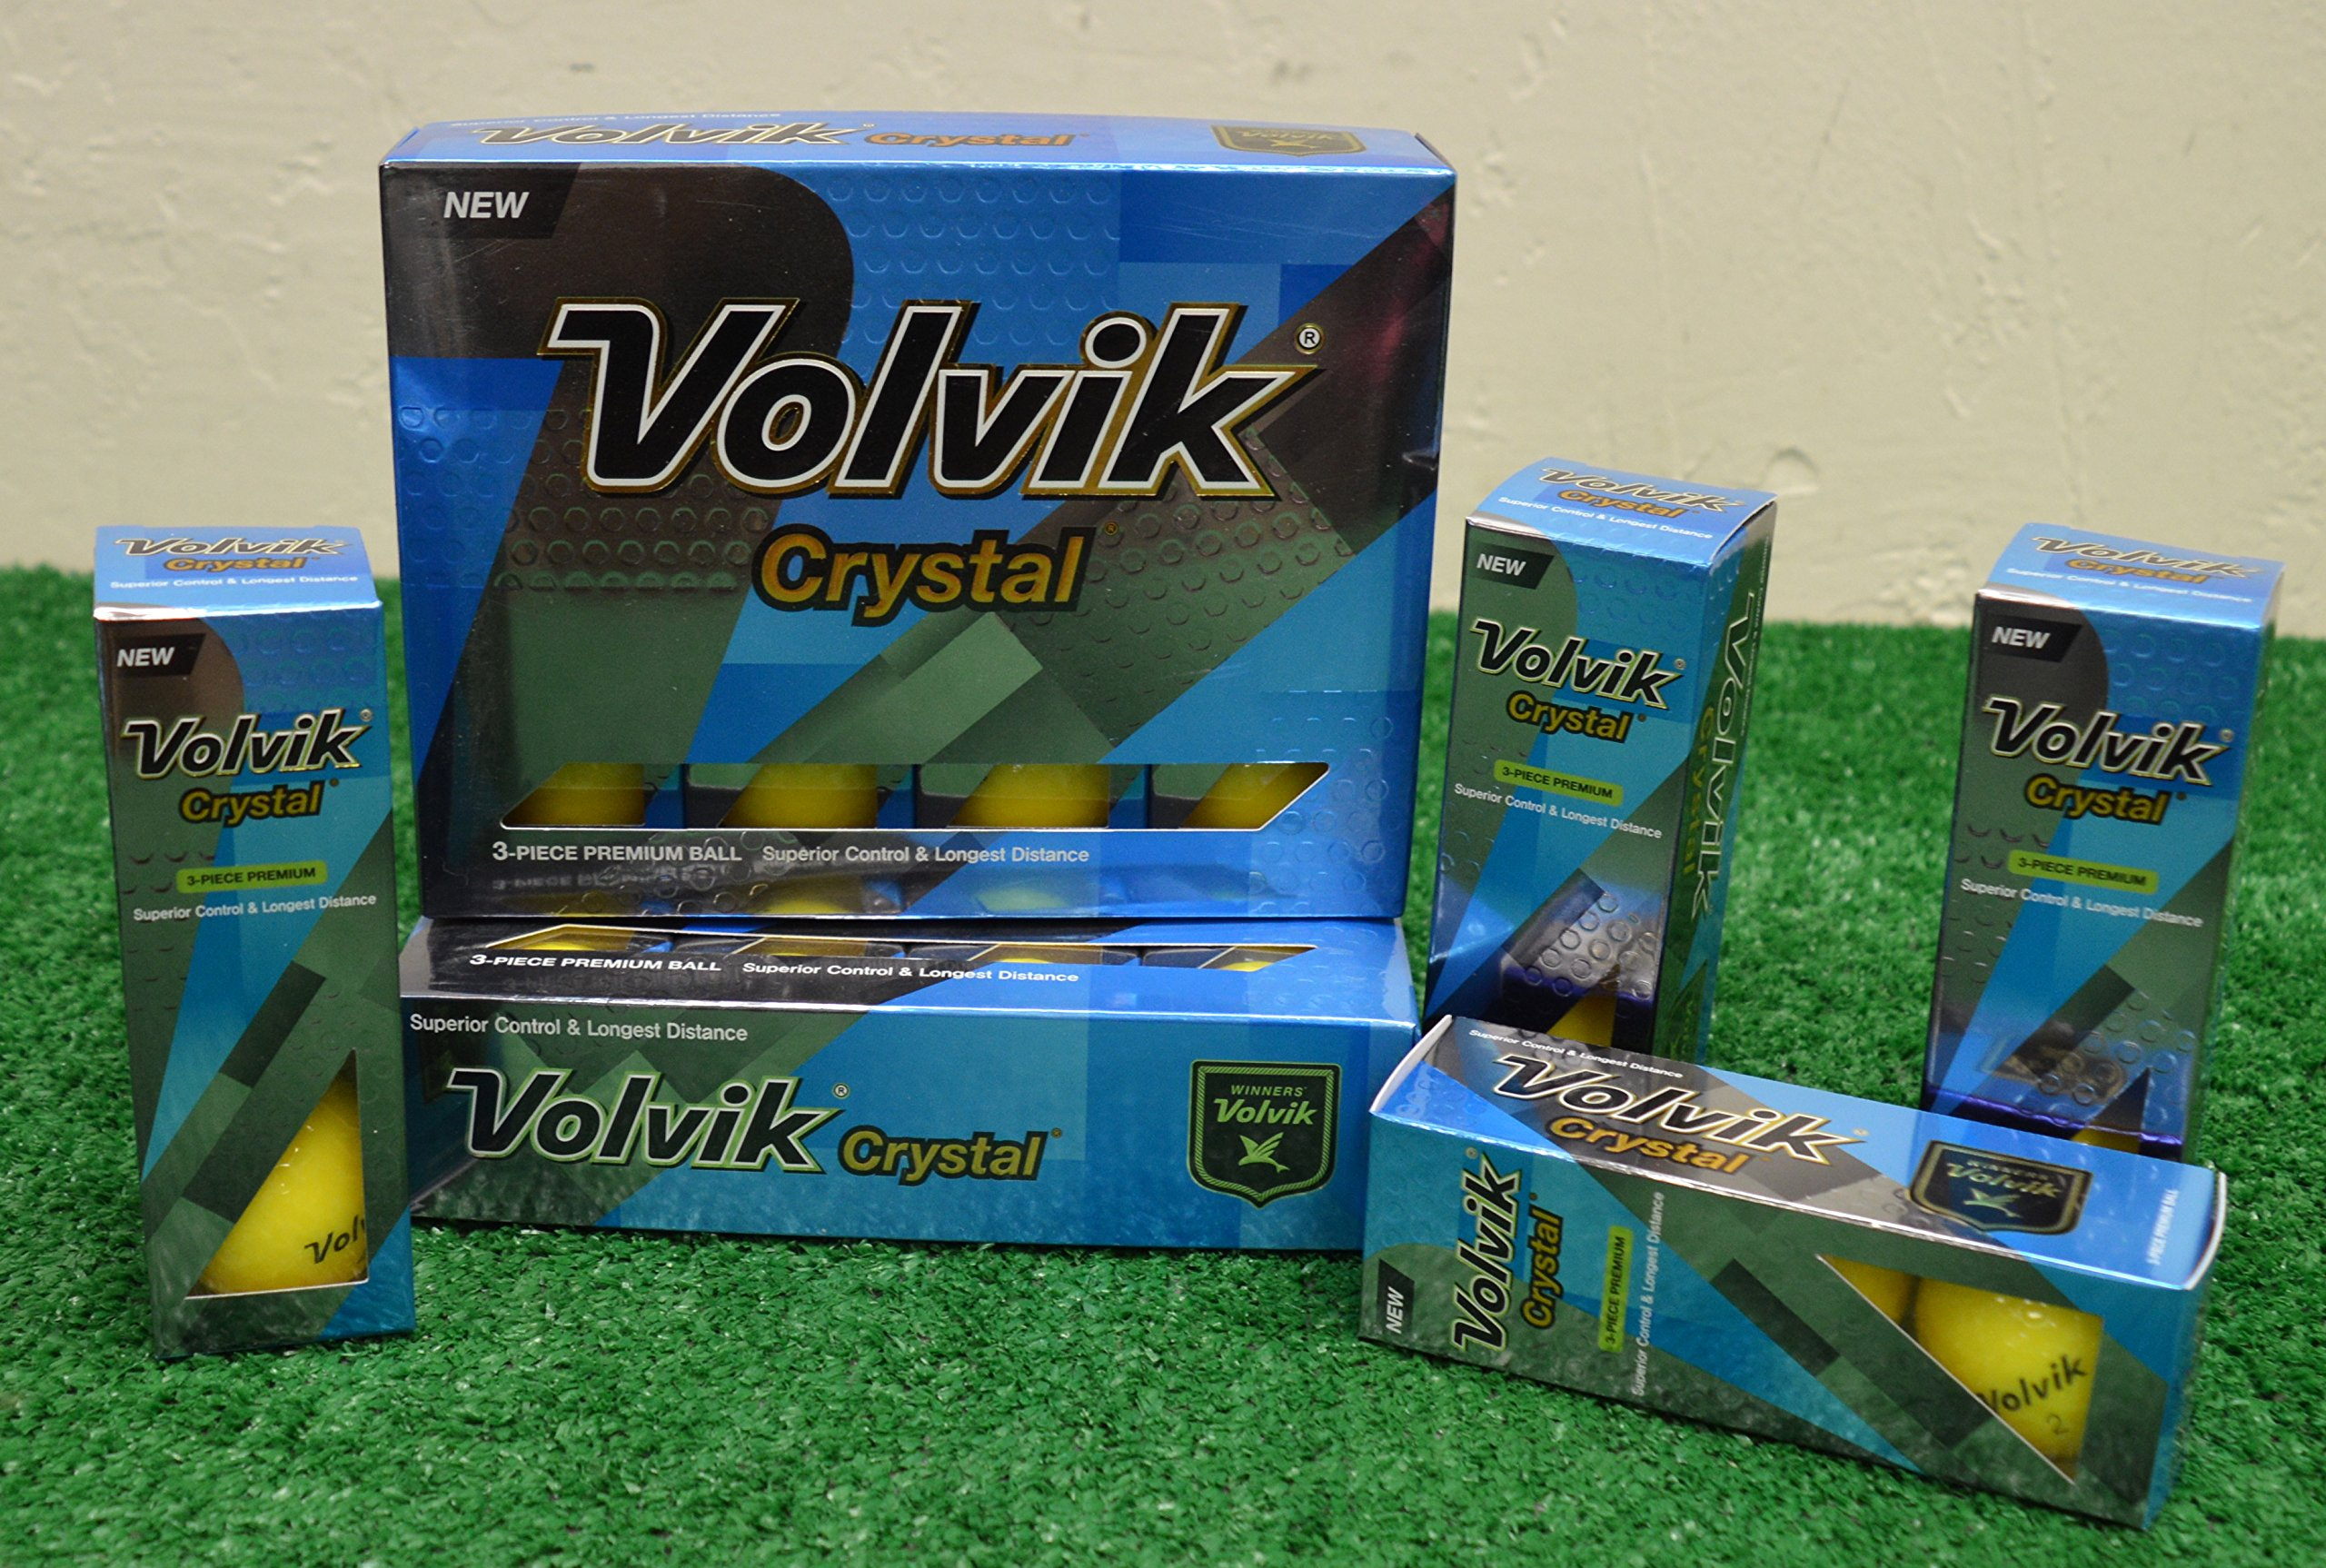 3 Dozen Volvik Crystal Yellow Golf Balls - New in Box